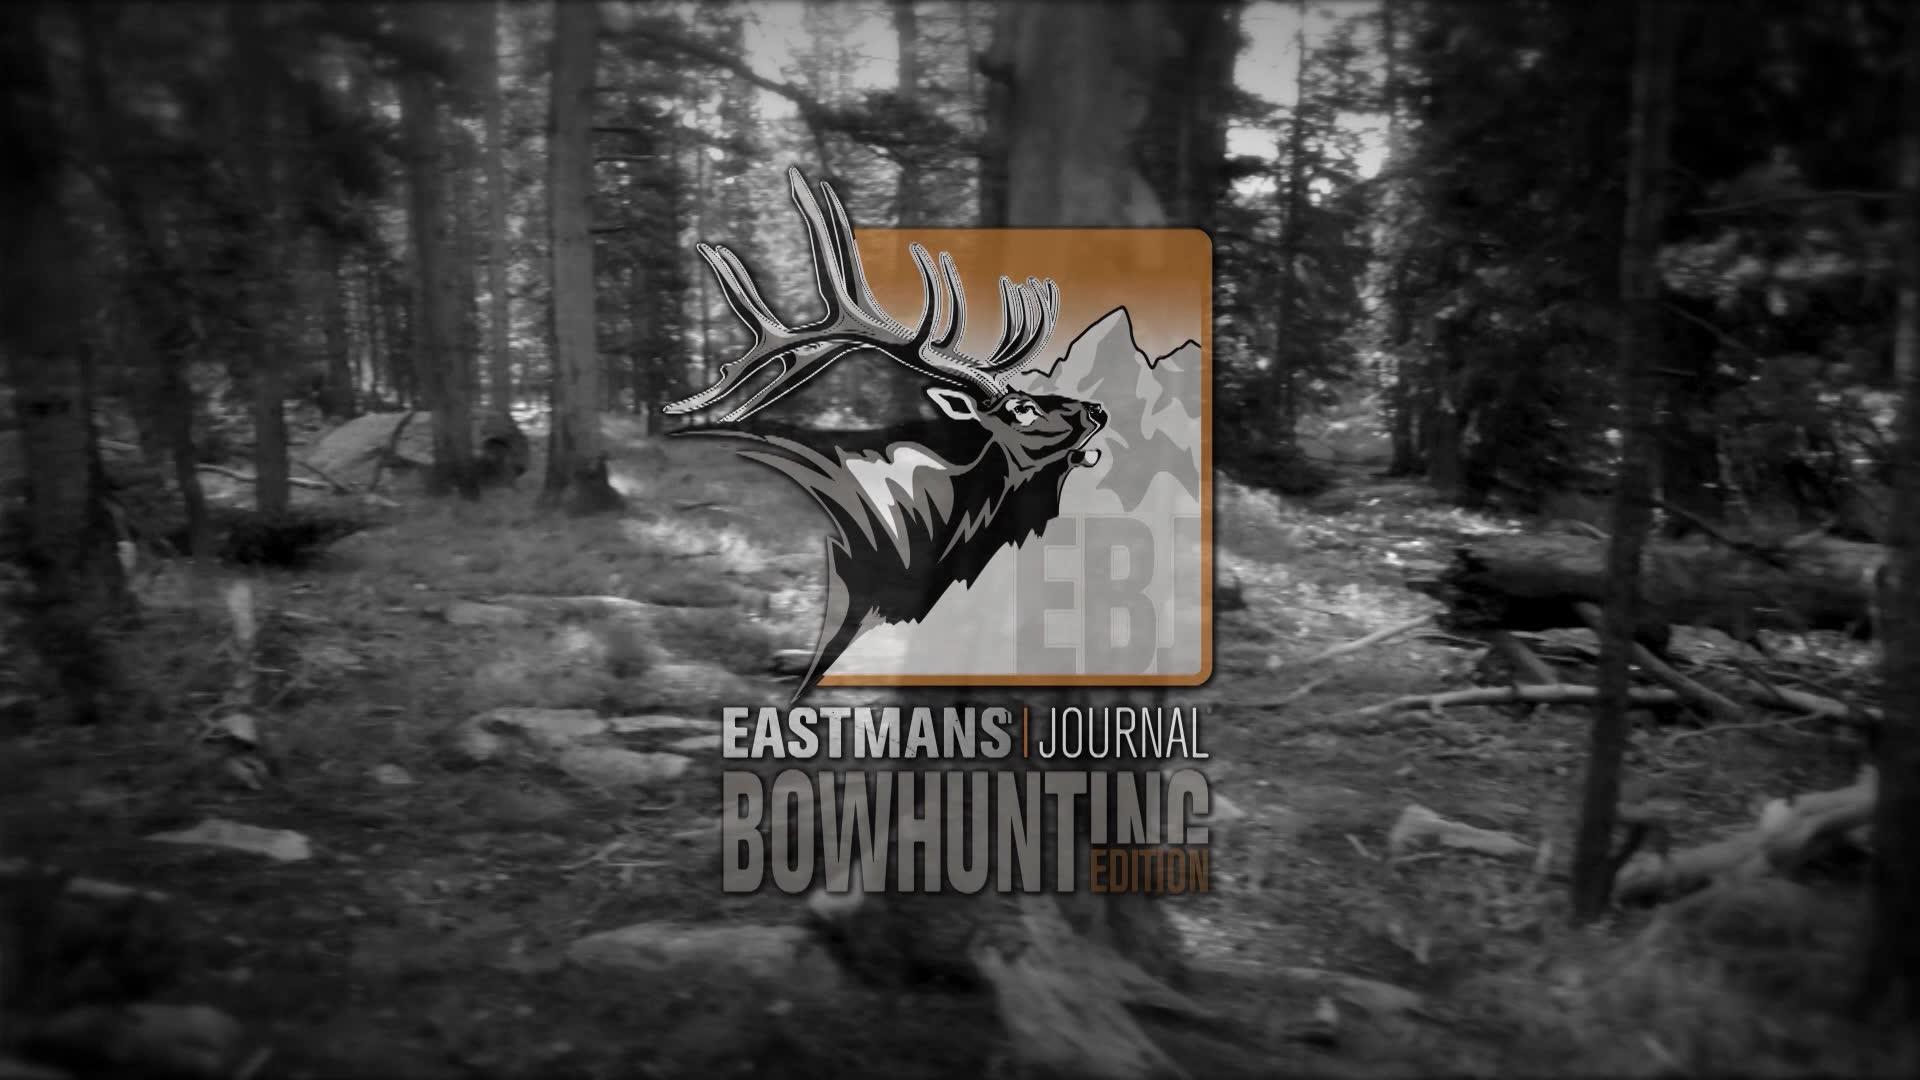 DIY Antelope Bowhunt in Wyoming